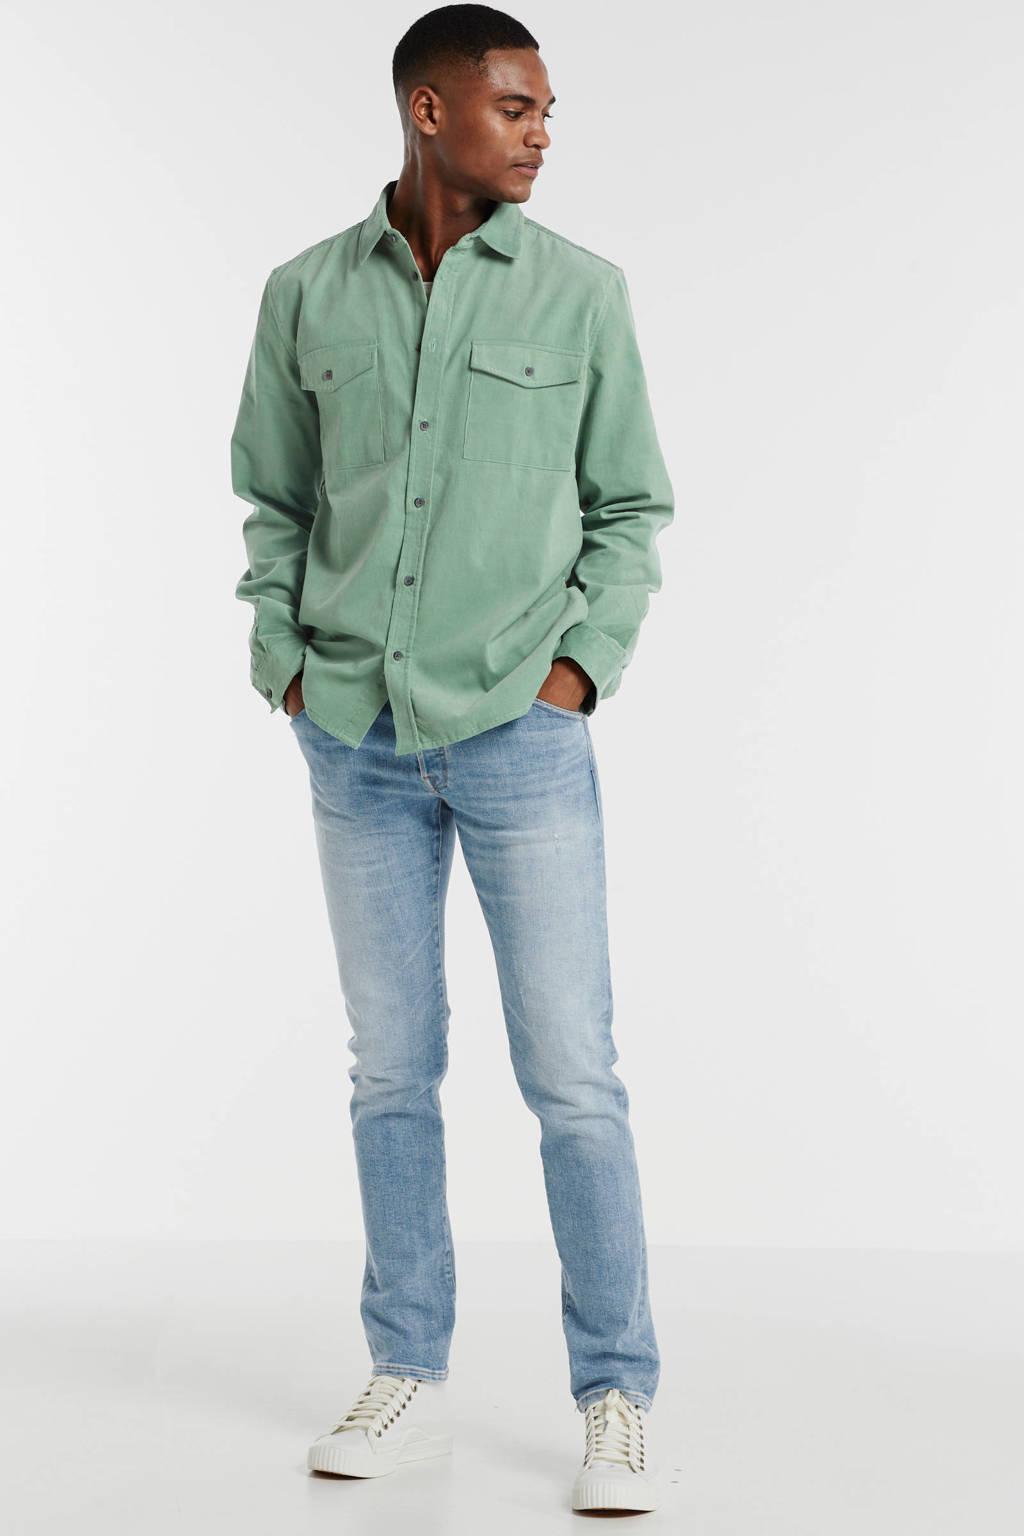 Jack & Jones Jeans Intelligence skinny jeans Liam, Light denim